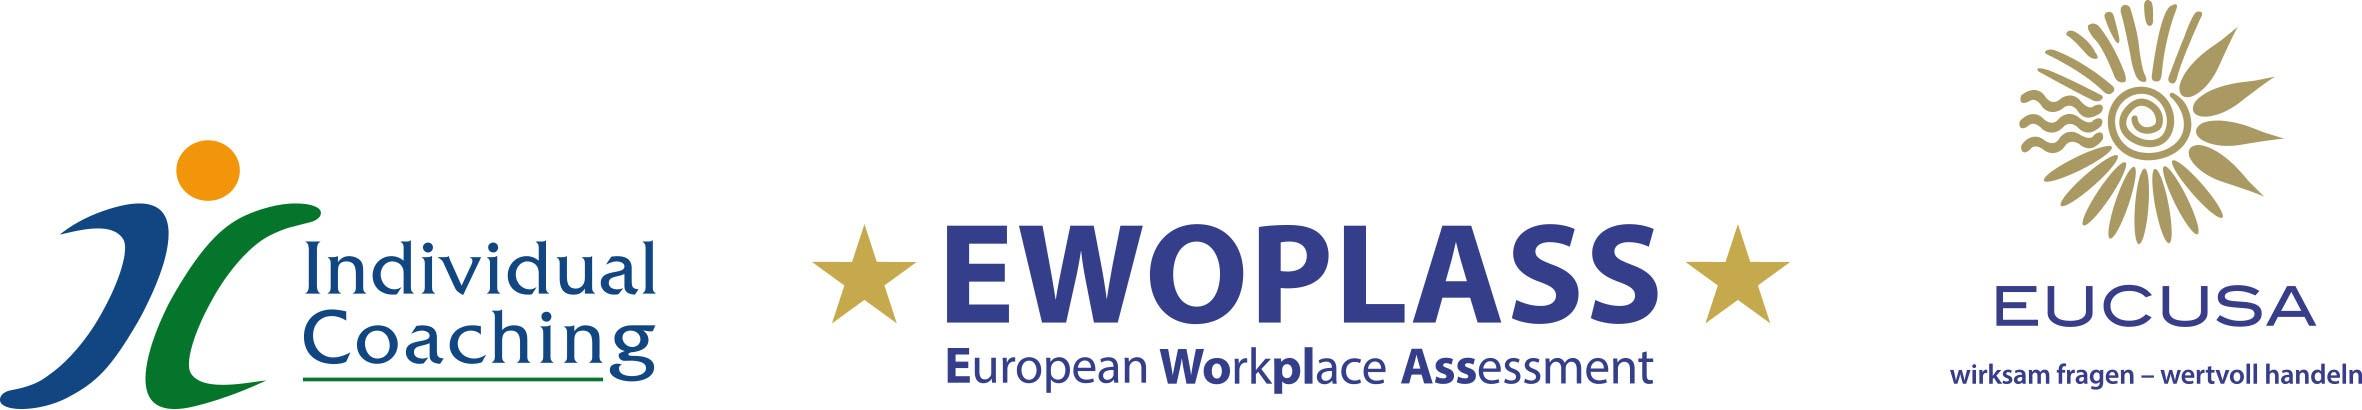 Logo EWOPLASS